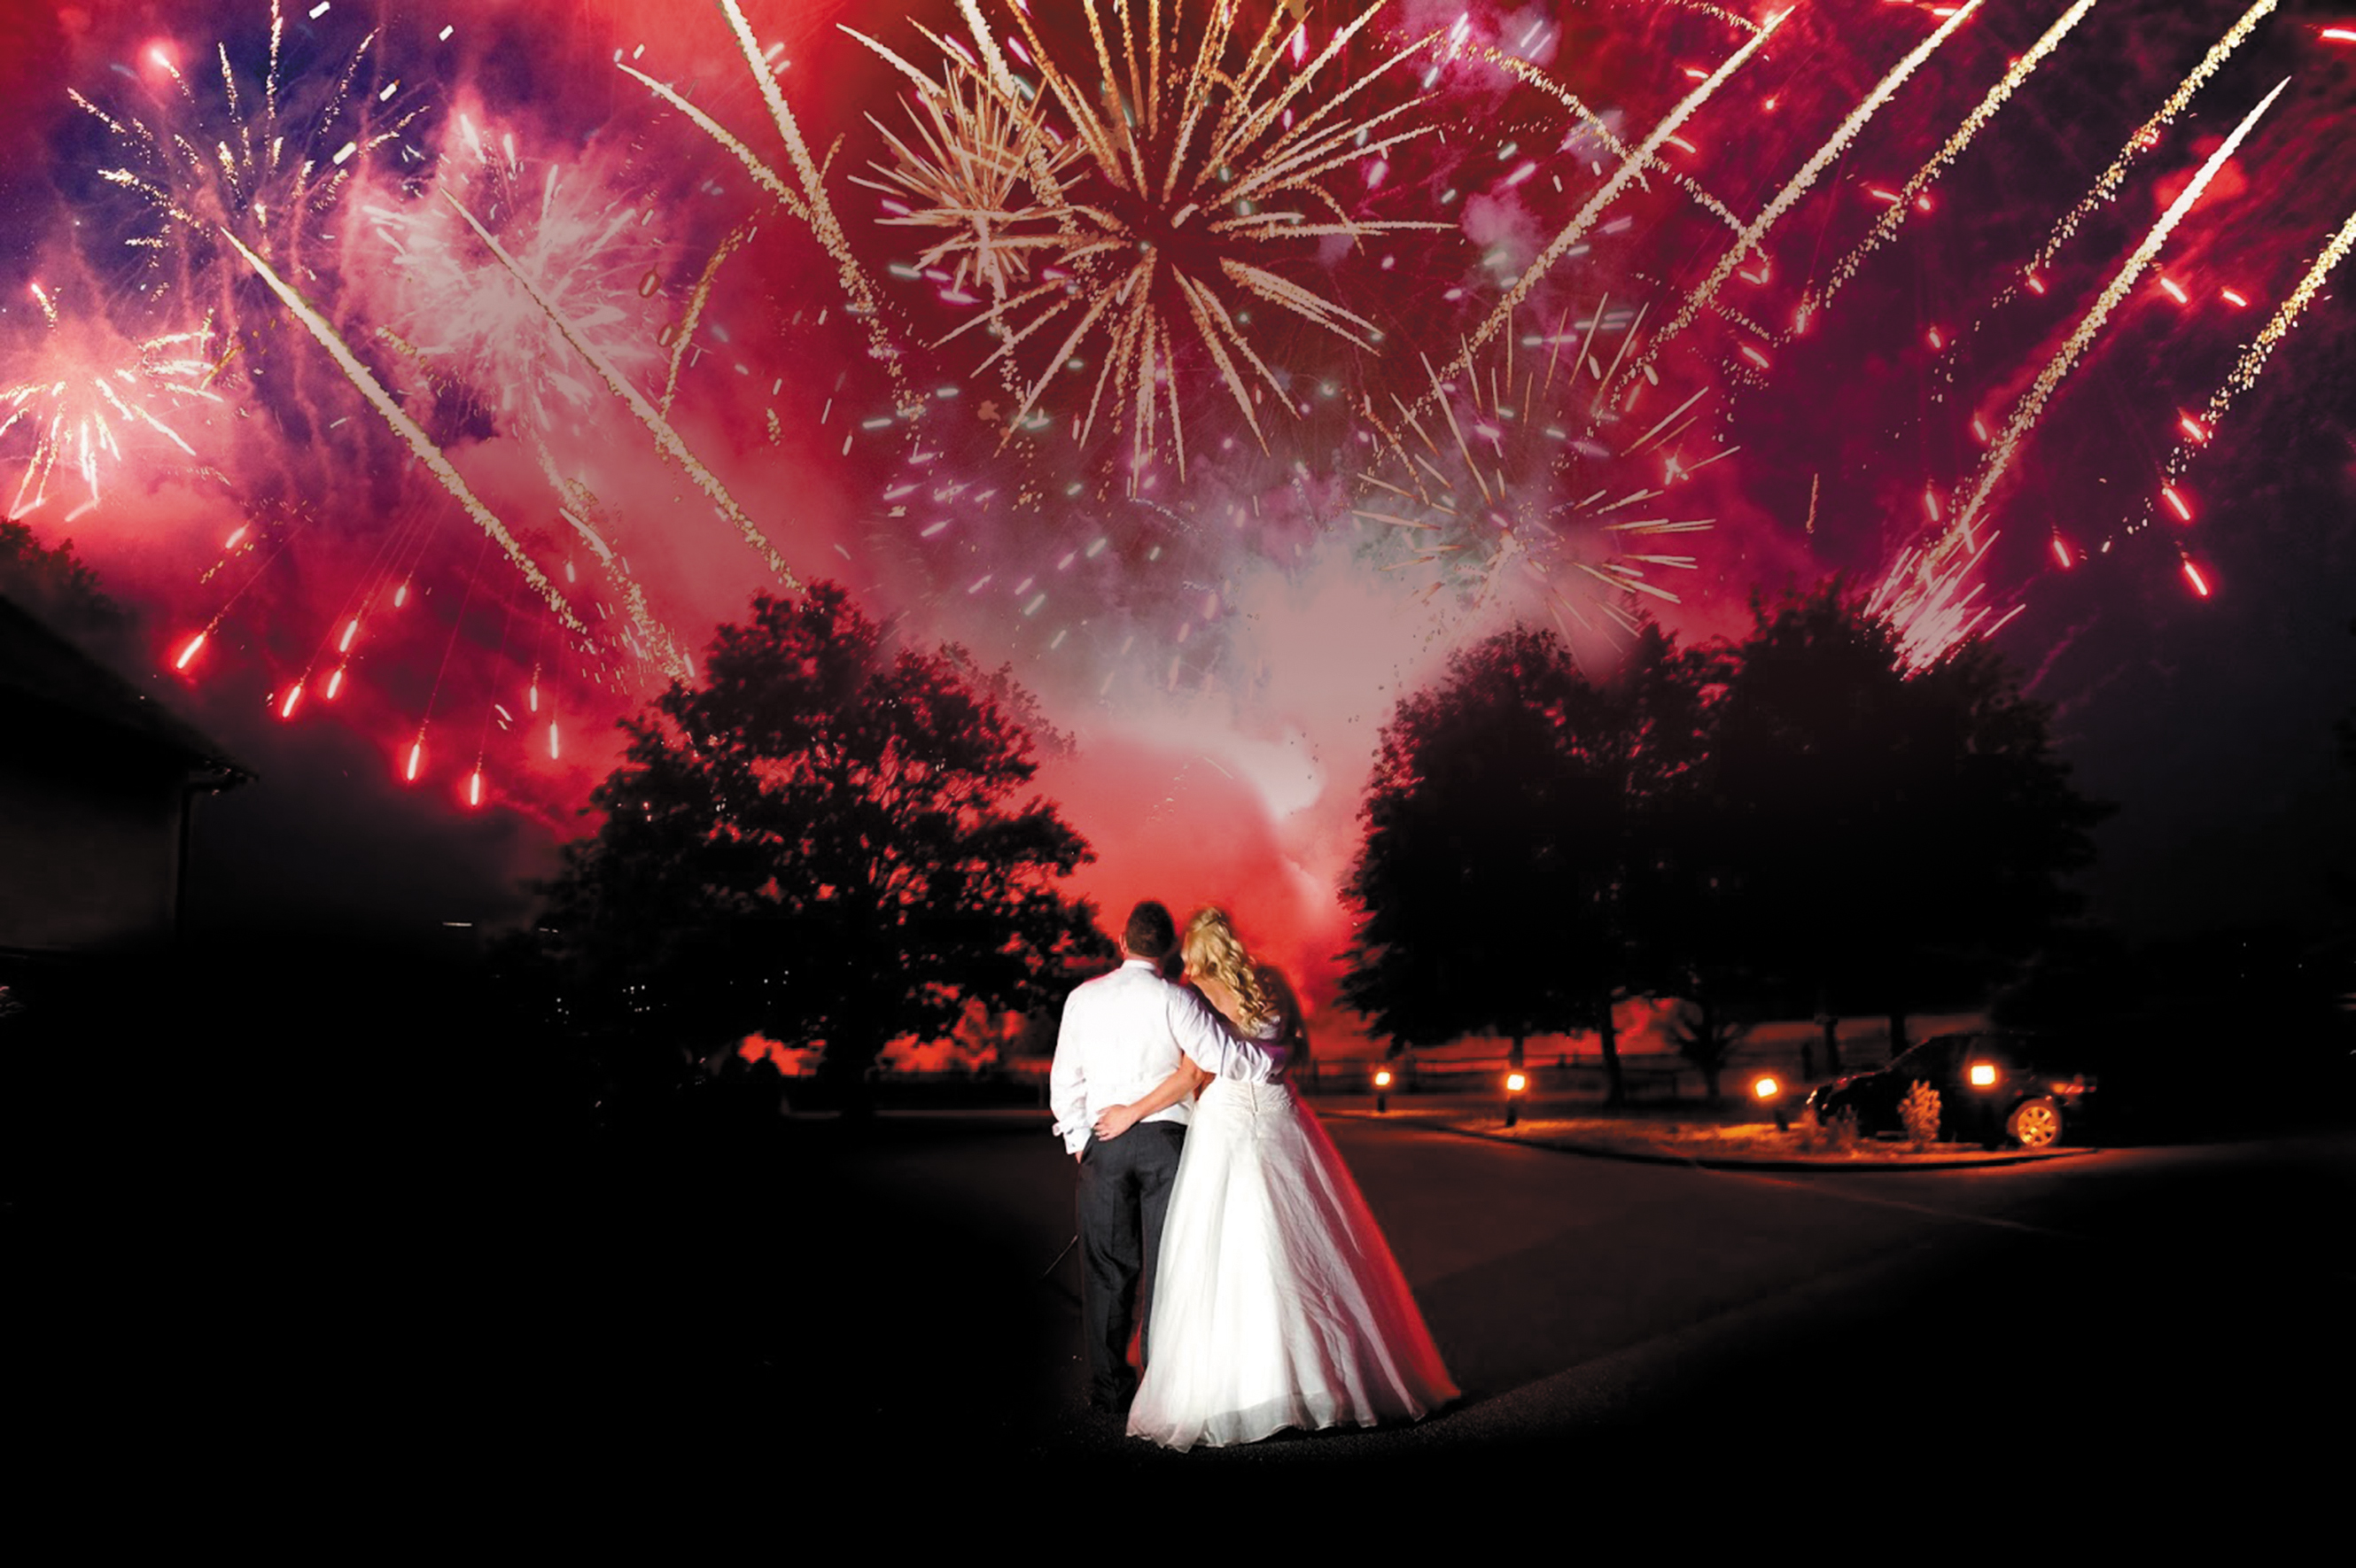 Салют на свадьбе - фото фаер-шоу, красивый фейерверк 66